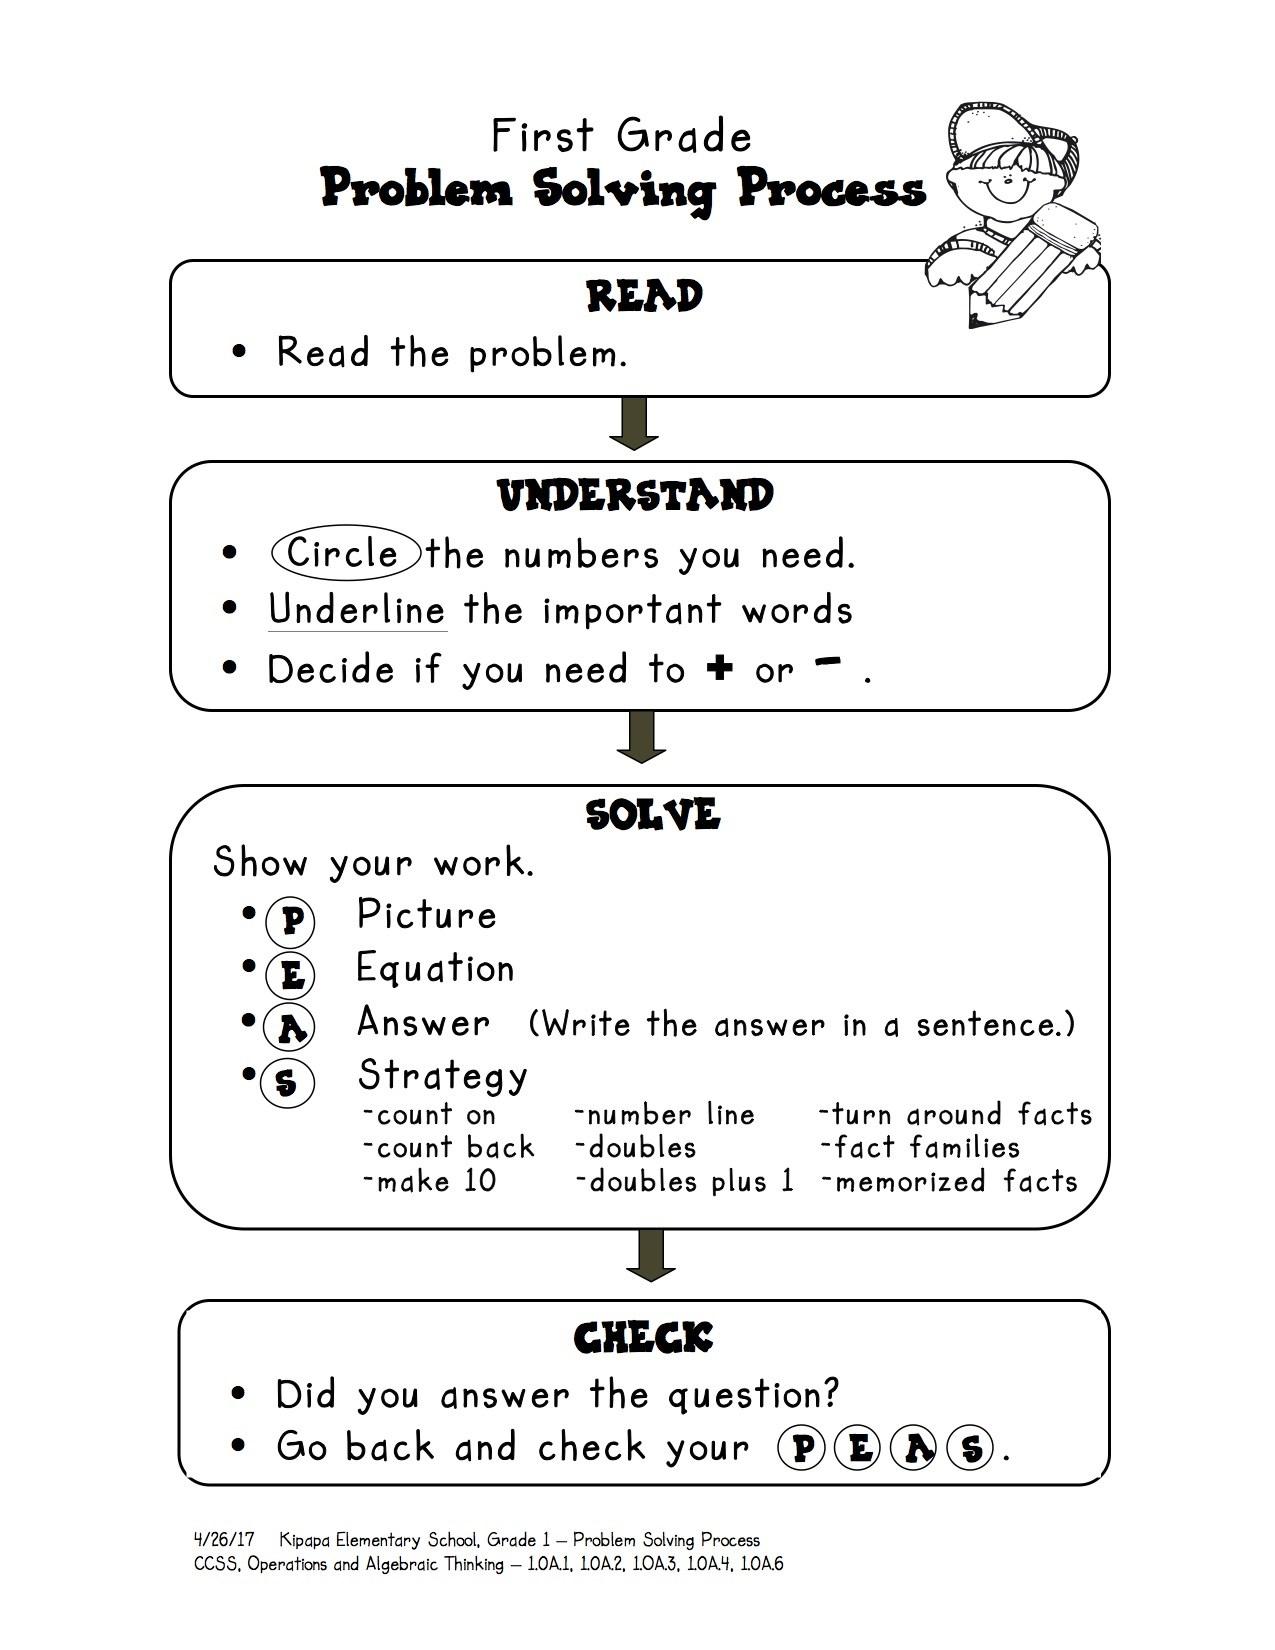 First Grade Problem Solving Process 1st Grade Kipapa